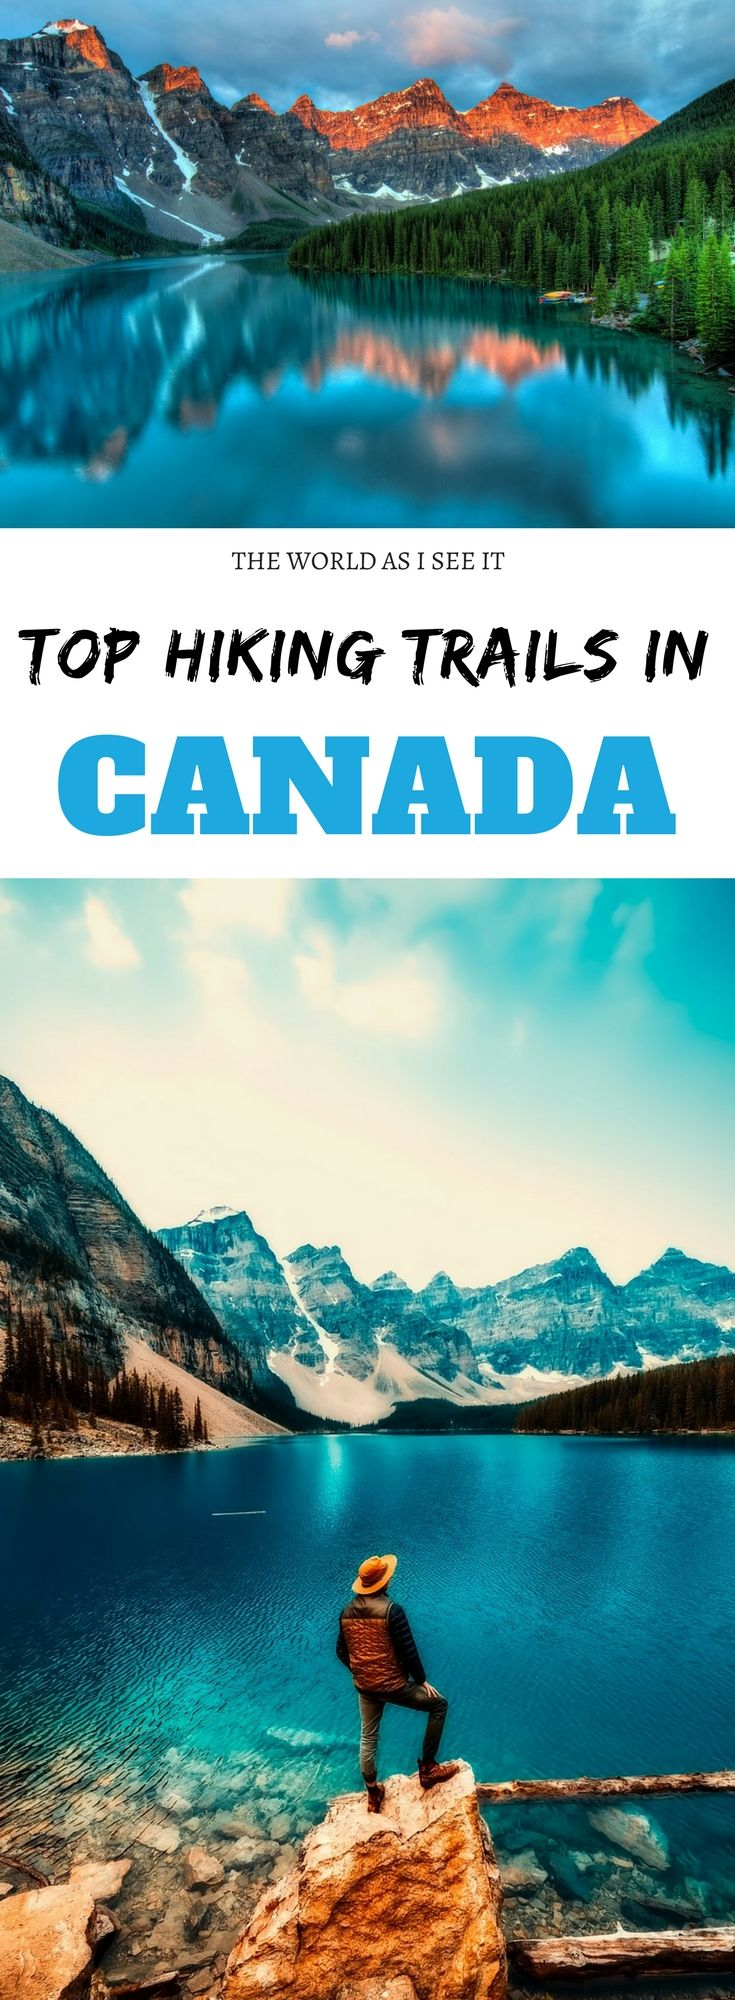 546 best Hiking + Travel images on Pinterest   Destinations ...